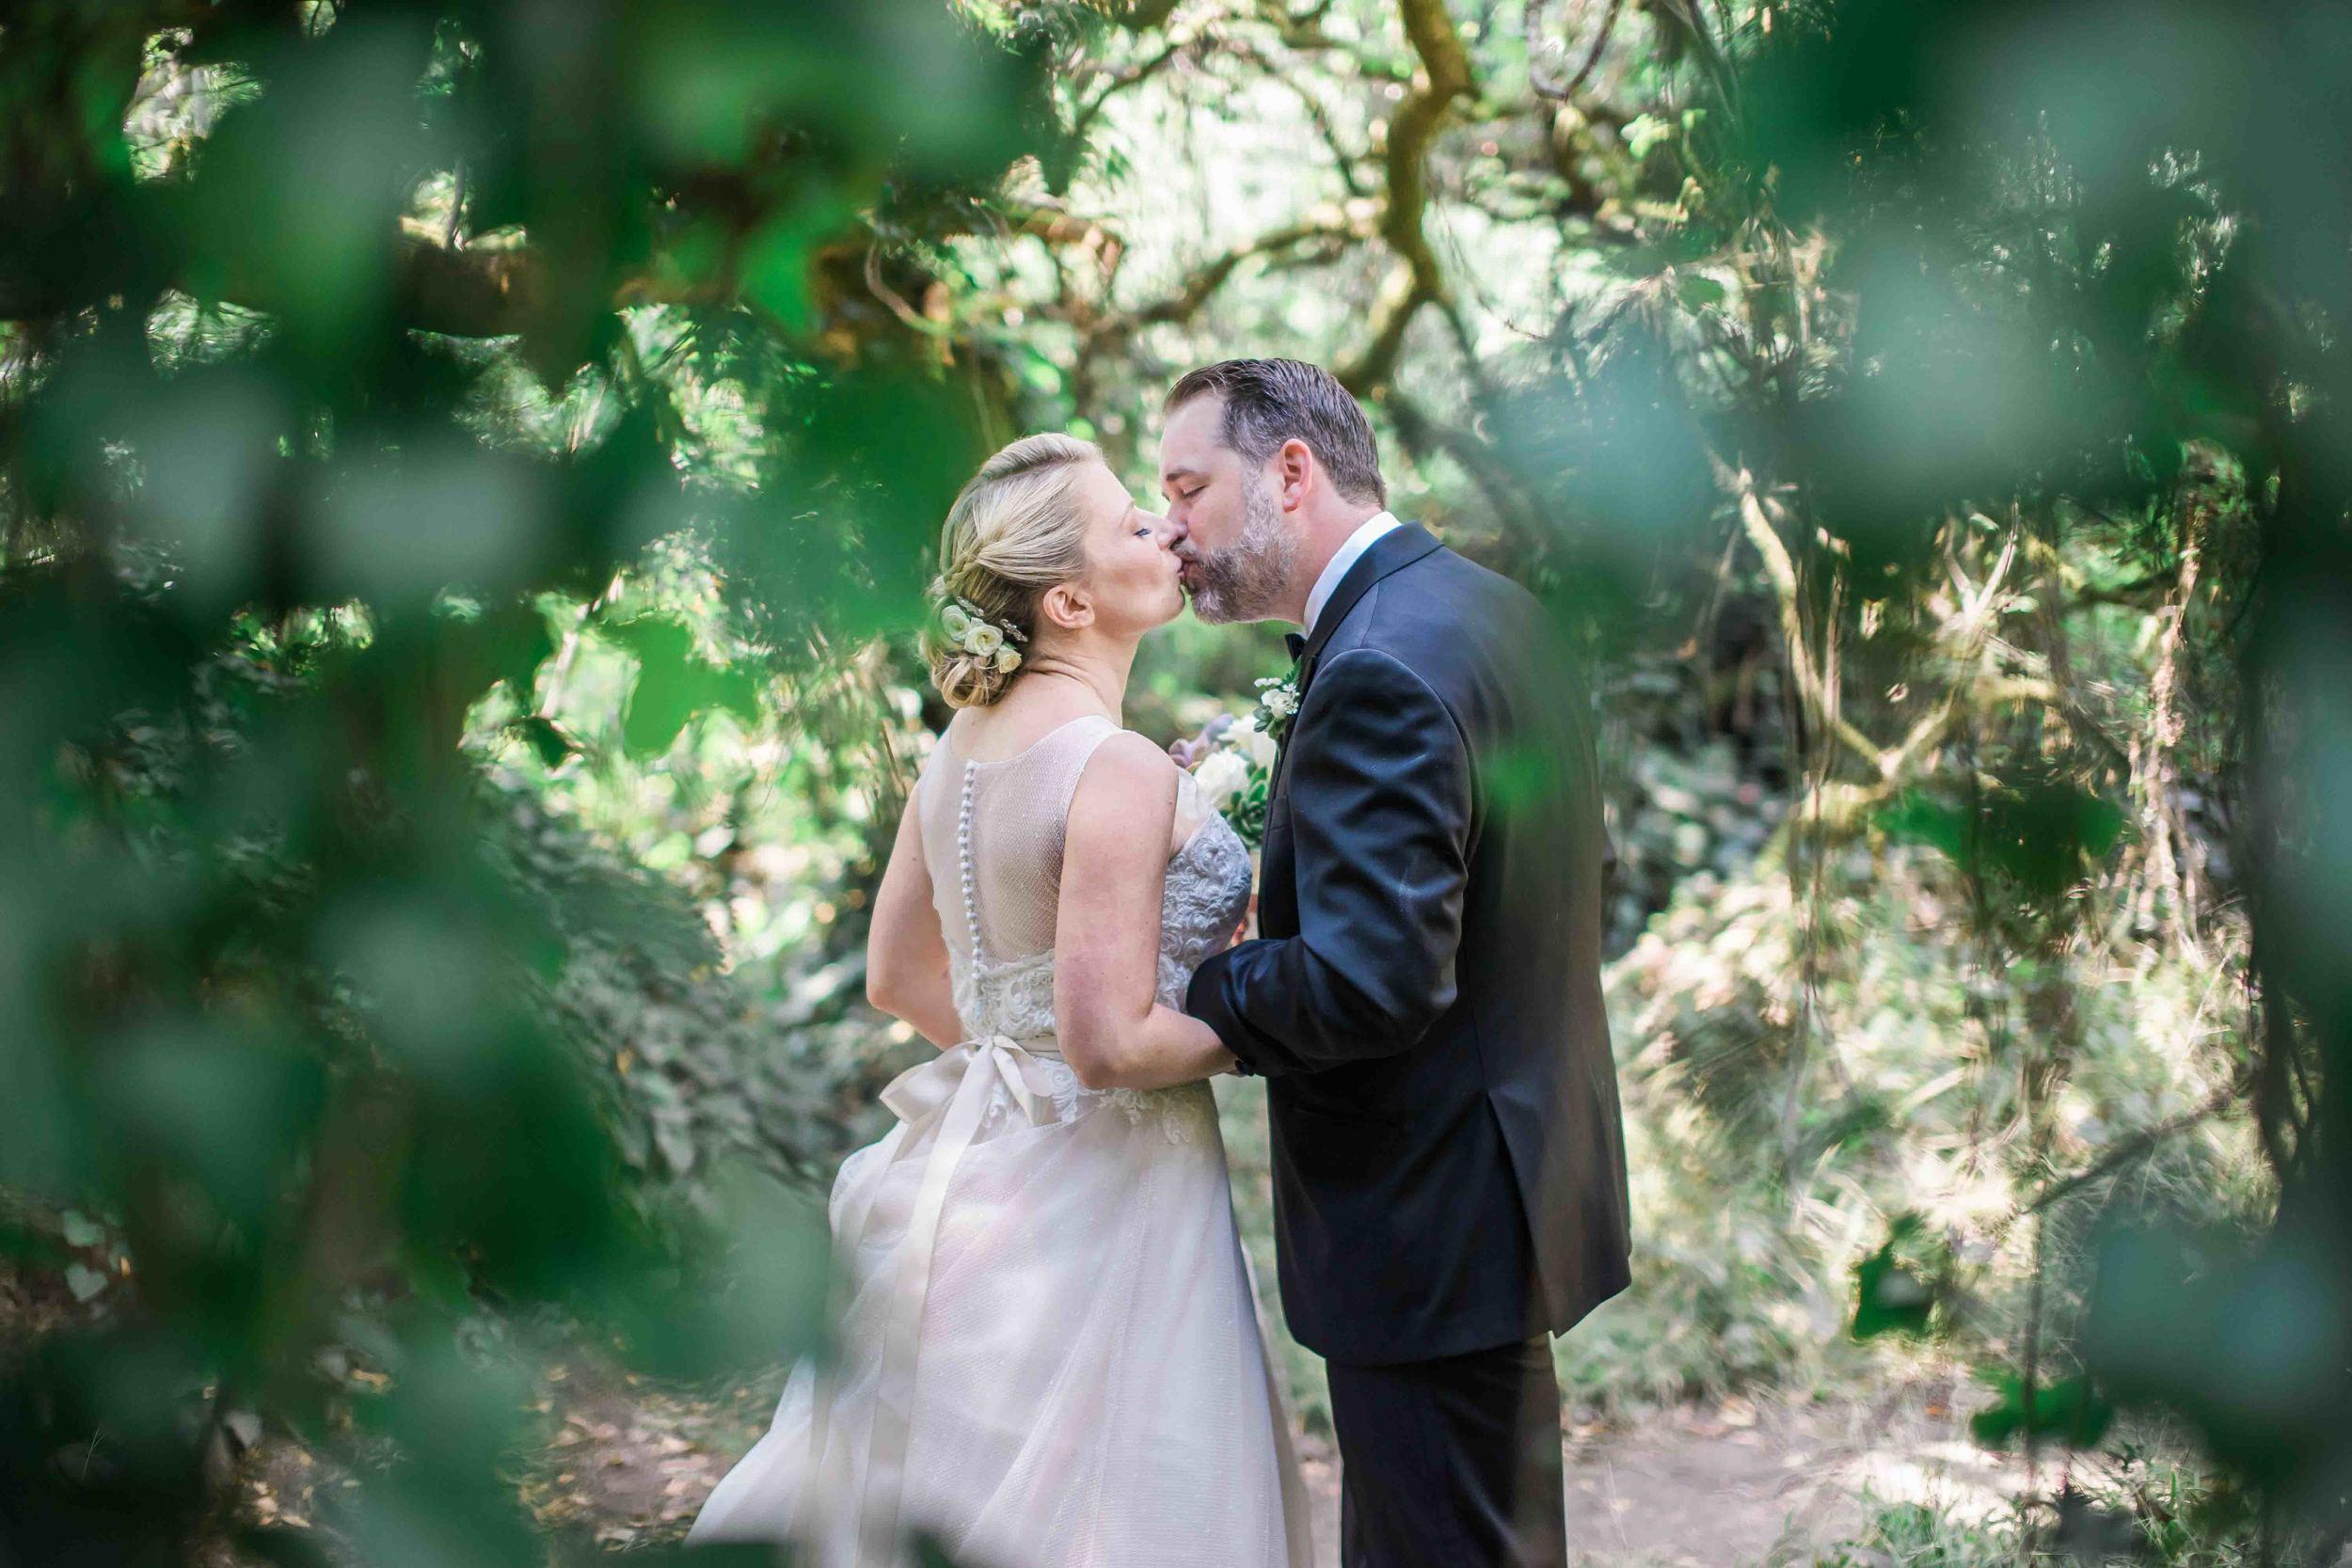 ChrisandAnja_WEDDING_Brienne_Michelle_Photography_230.JPG